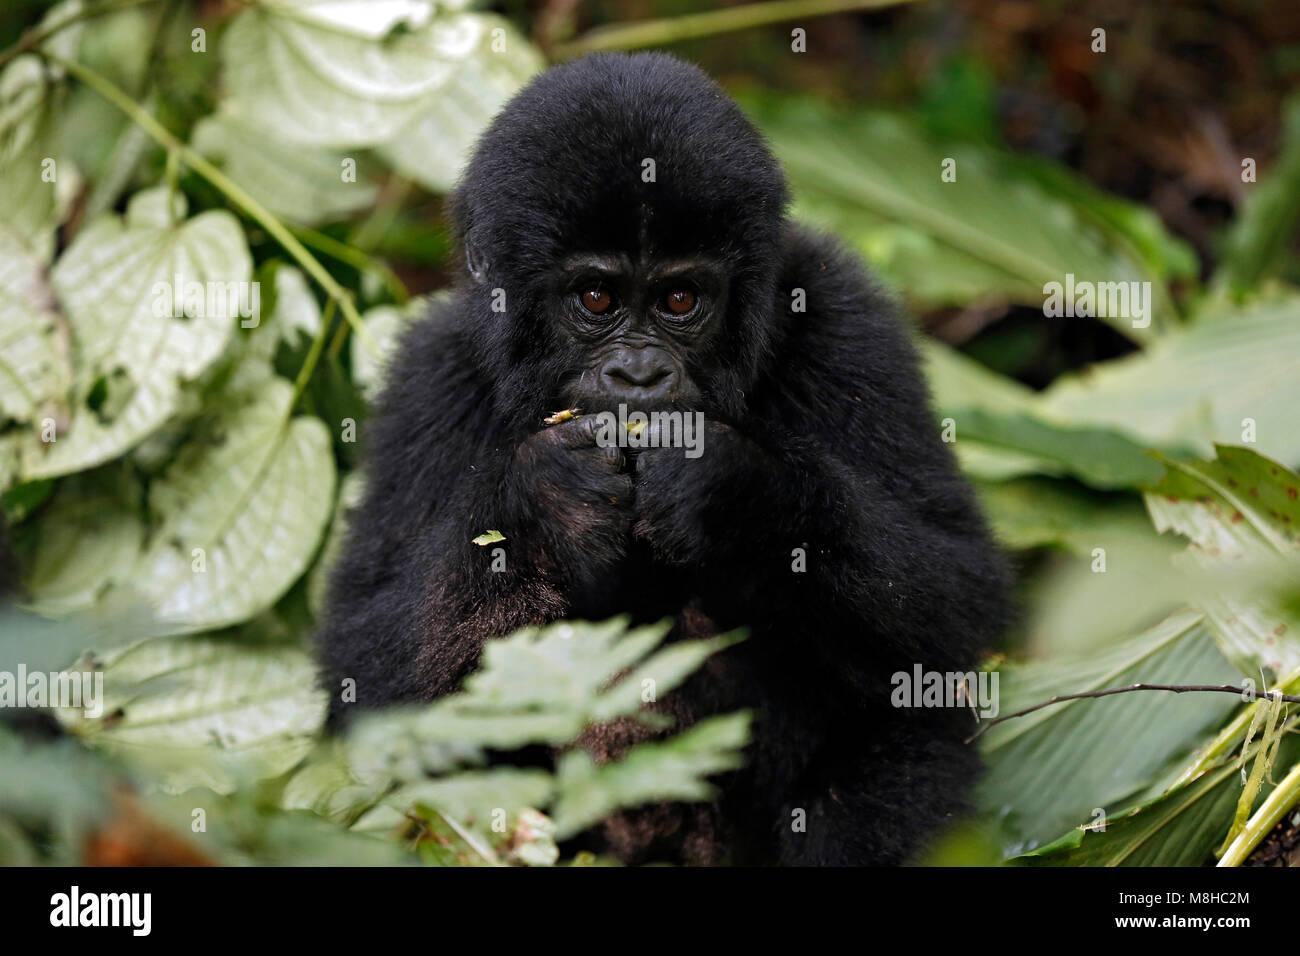 Baby Gorilla (Gorilla beringei beringei) Feeding. Bwindi Impenetrable National Park, Uganda - Stock Image